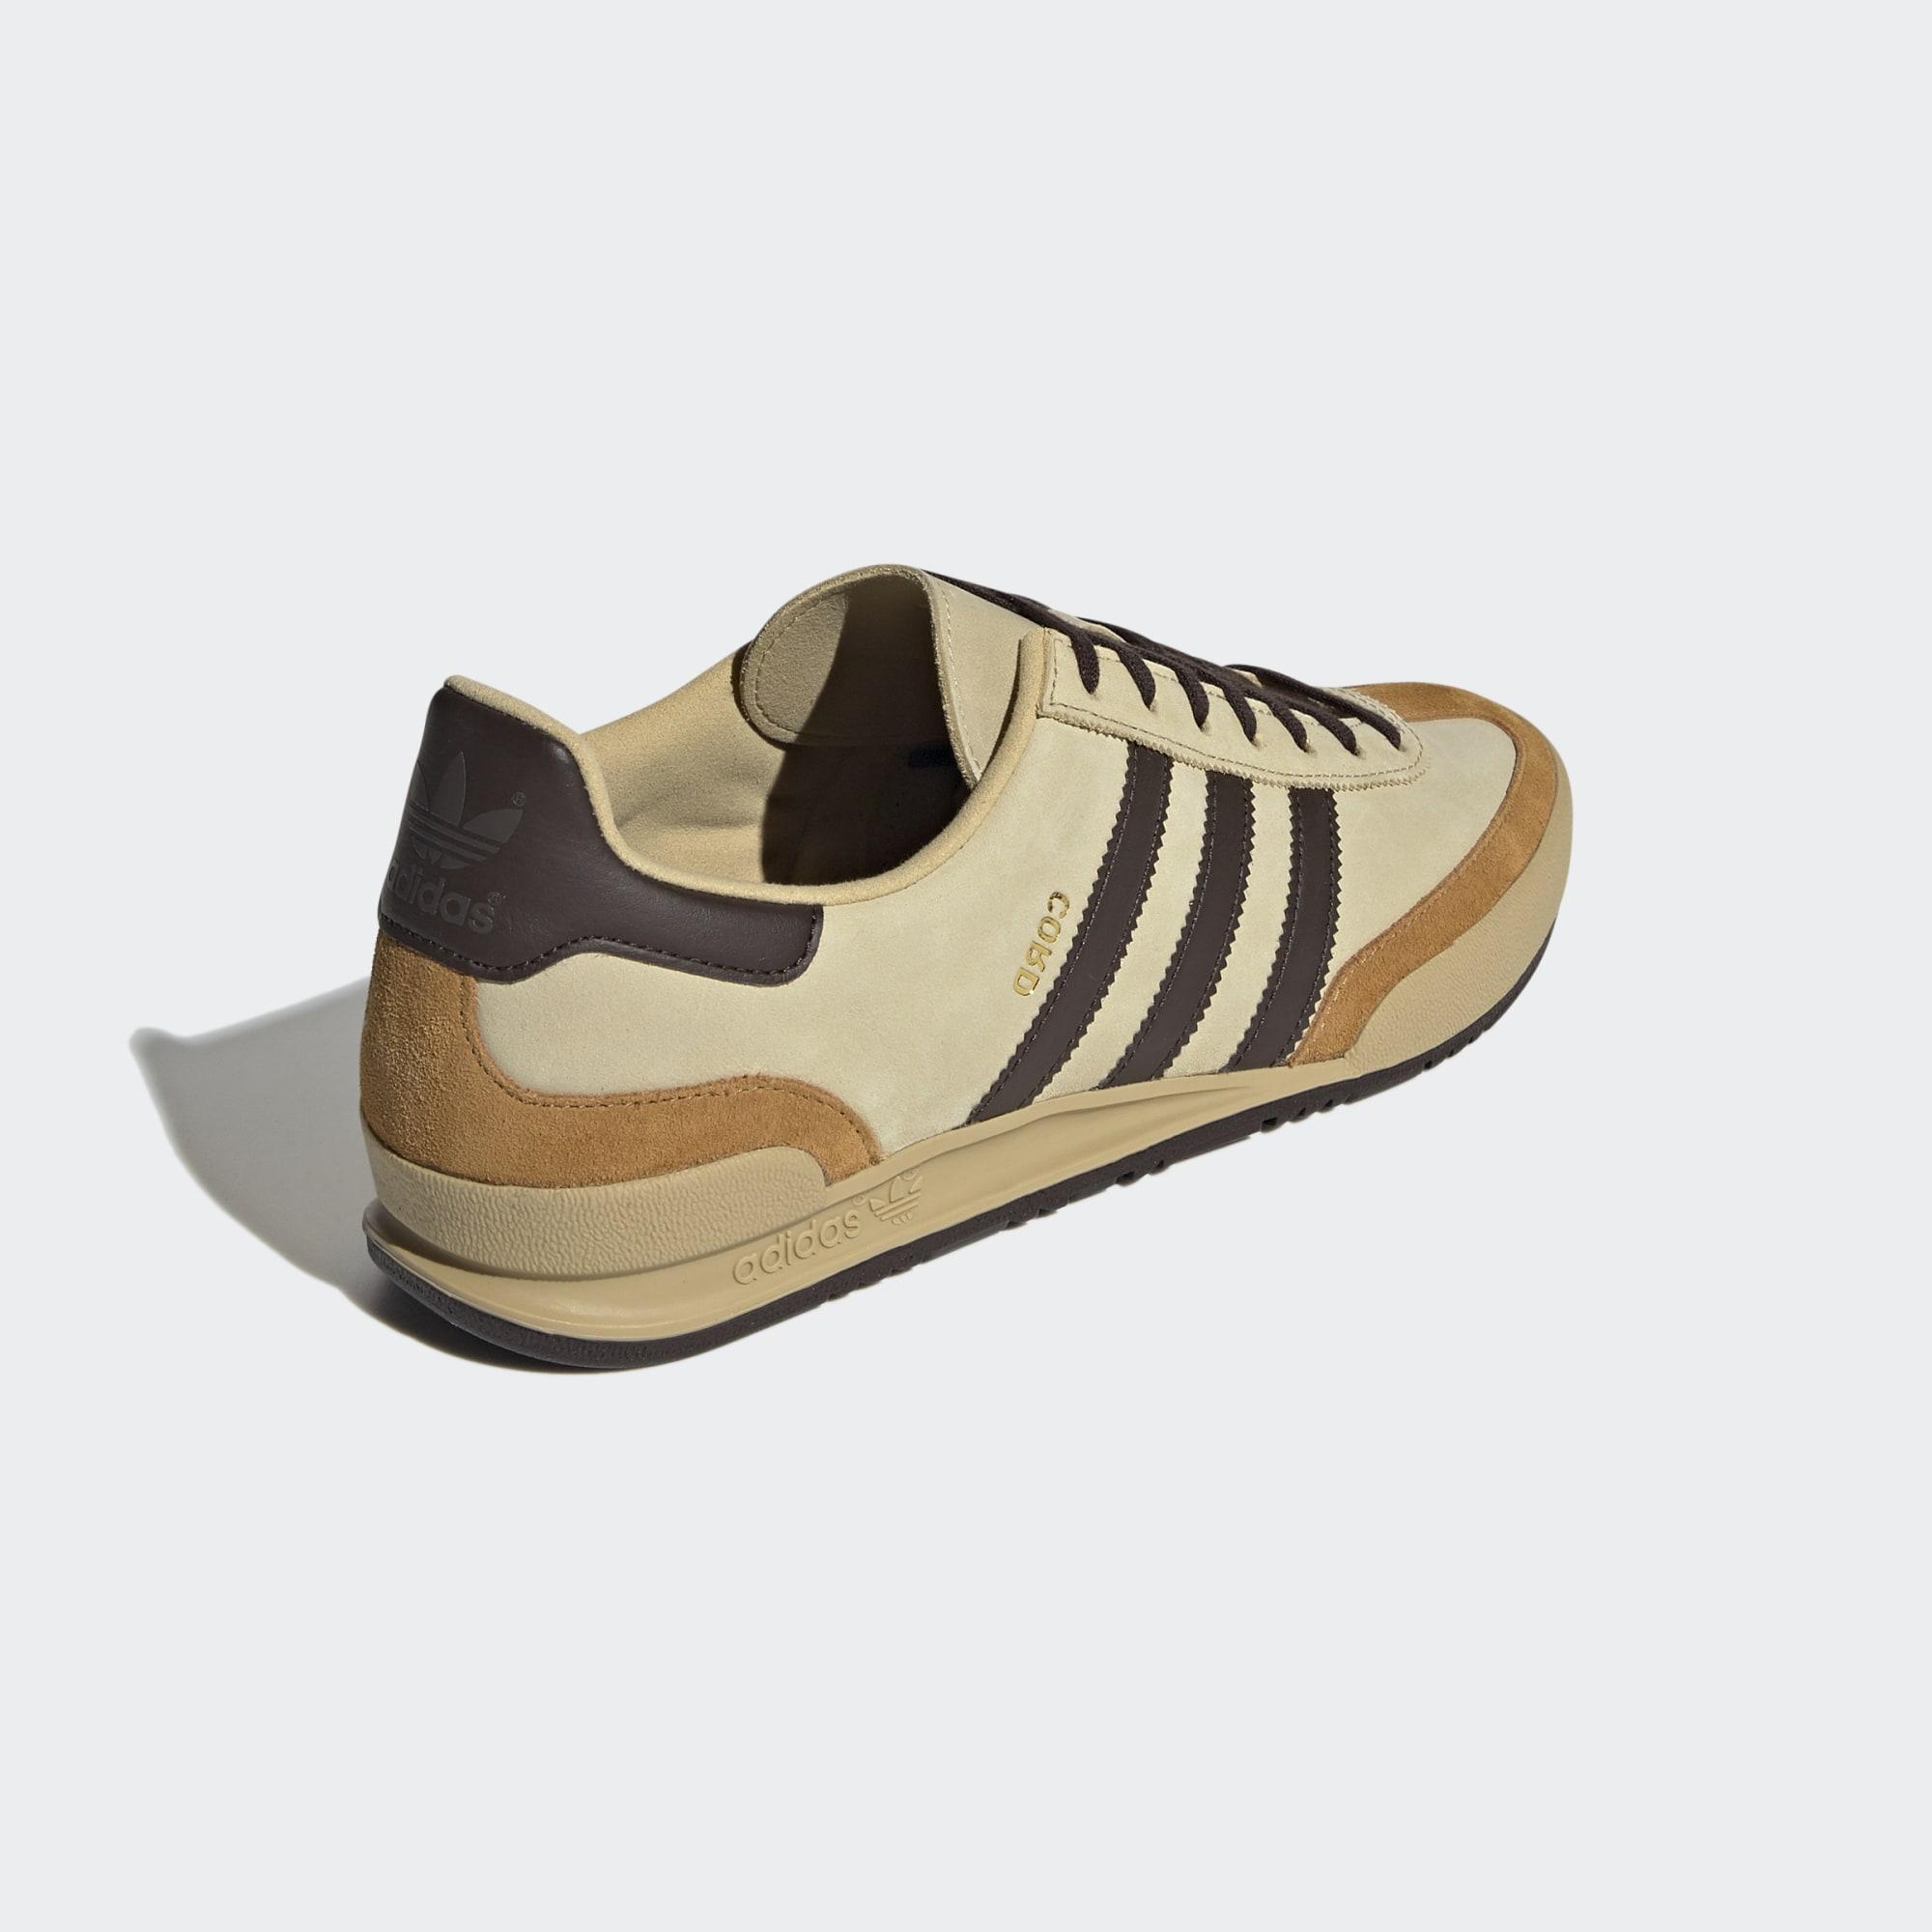 Cord_Shoes_Gul_FX5640_05_standard.jpg